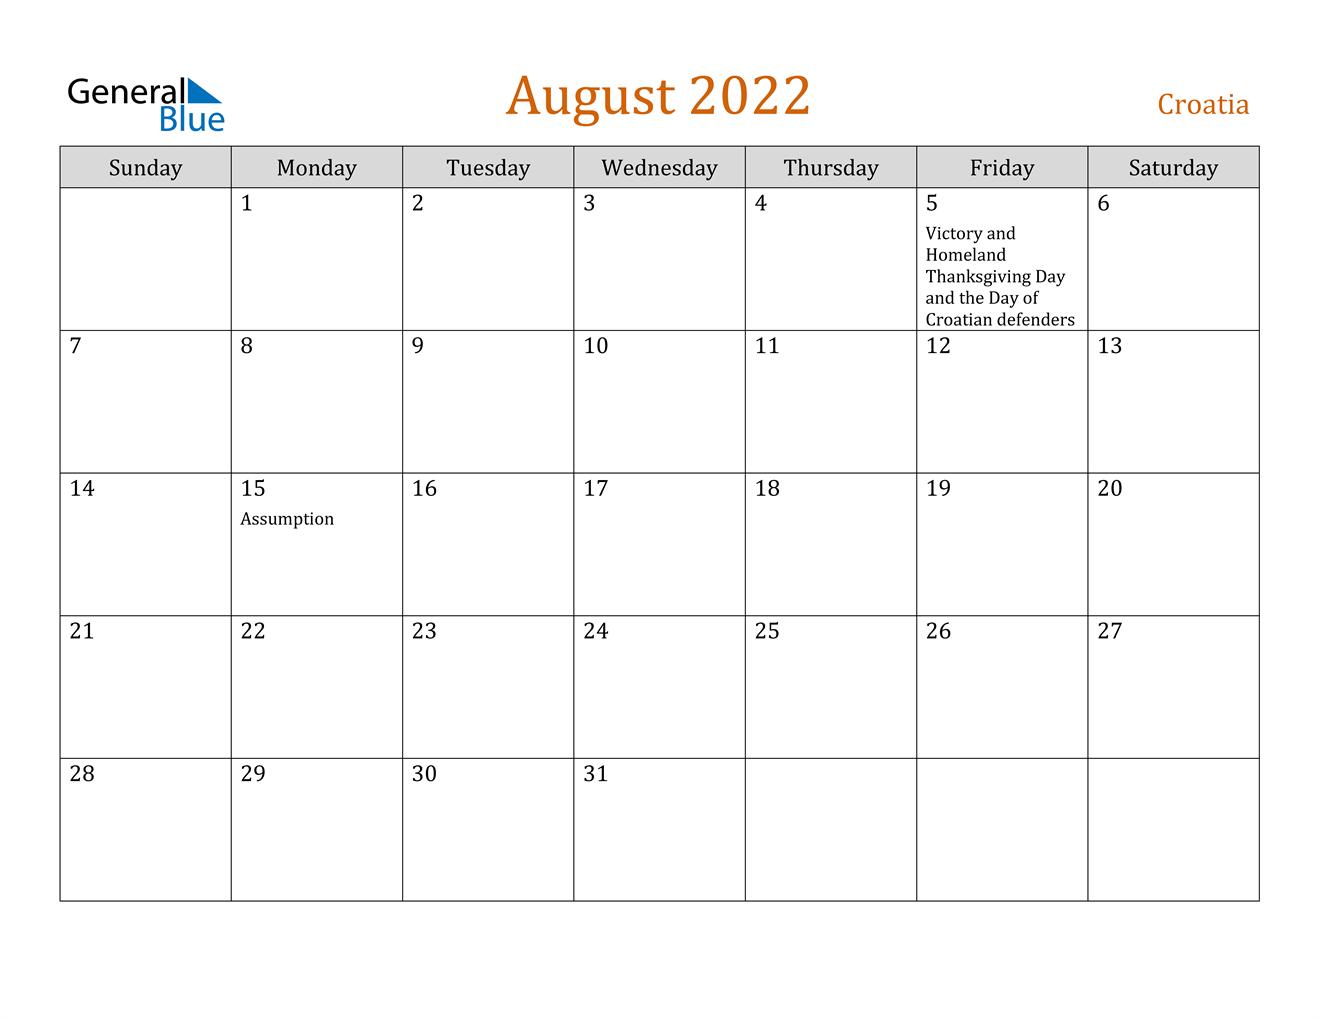 August 2022 Calendar - Croatia